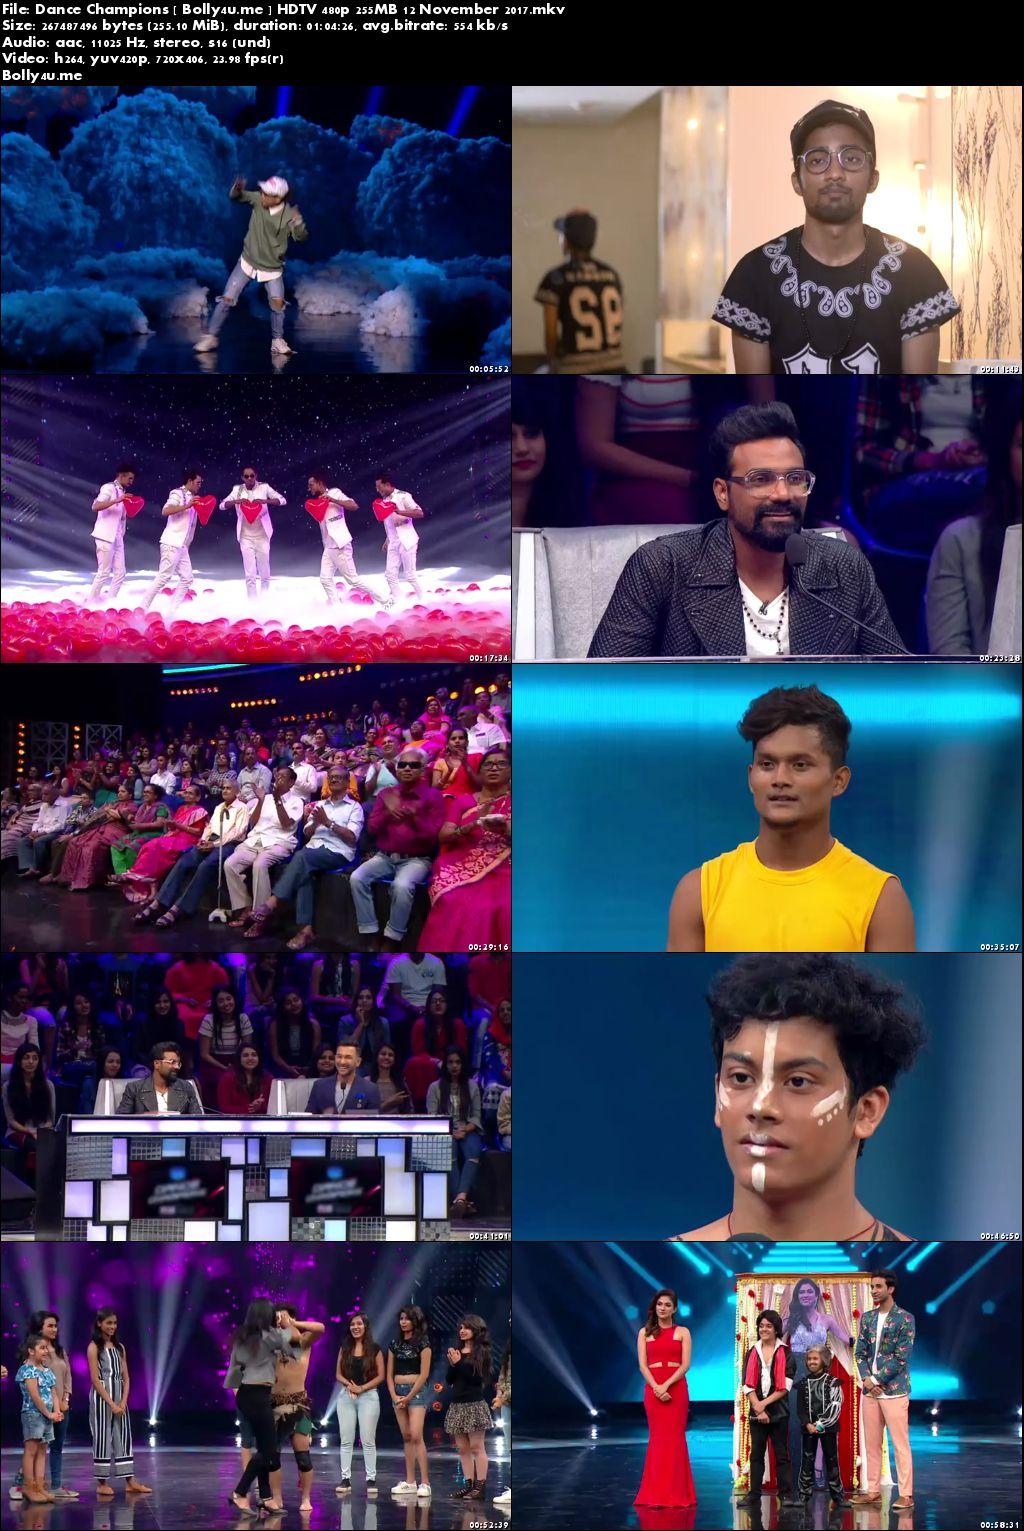 Dance Champions HDTV 480p 250MB 12 November 2017 Download